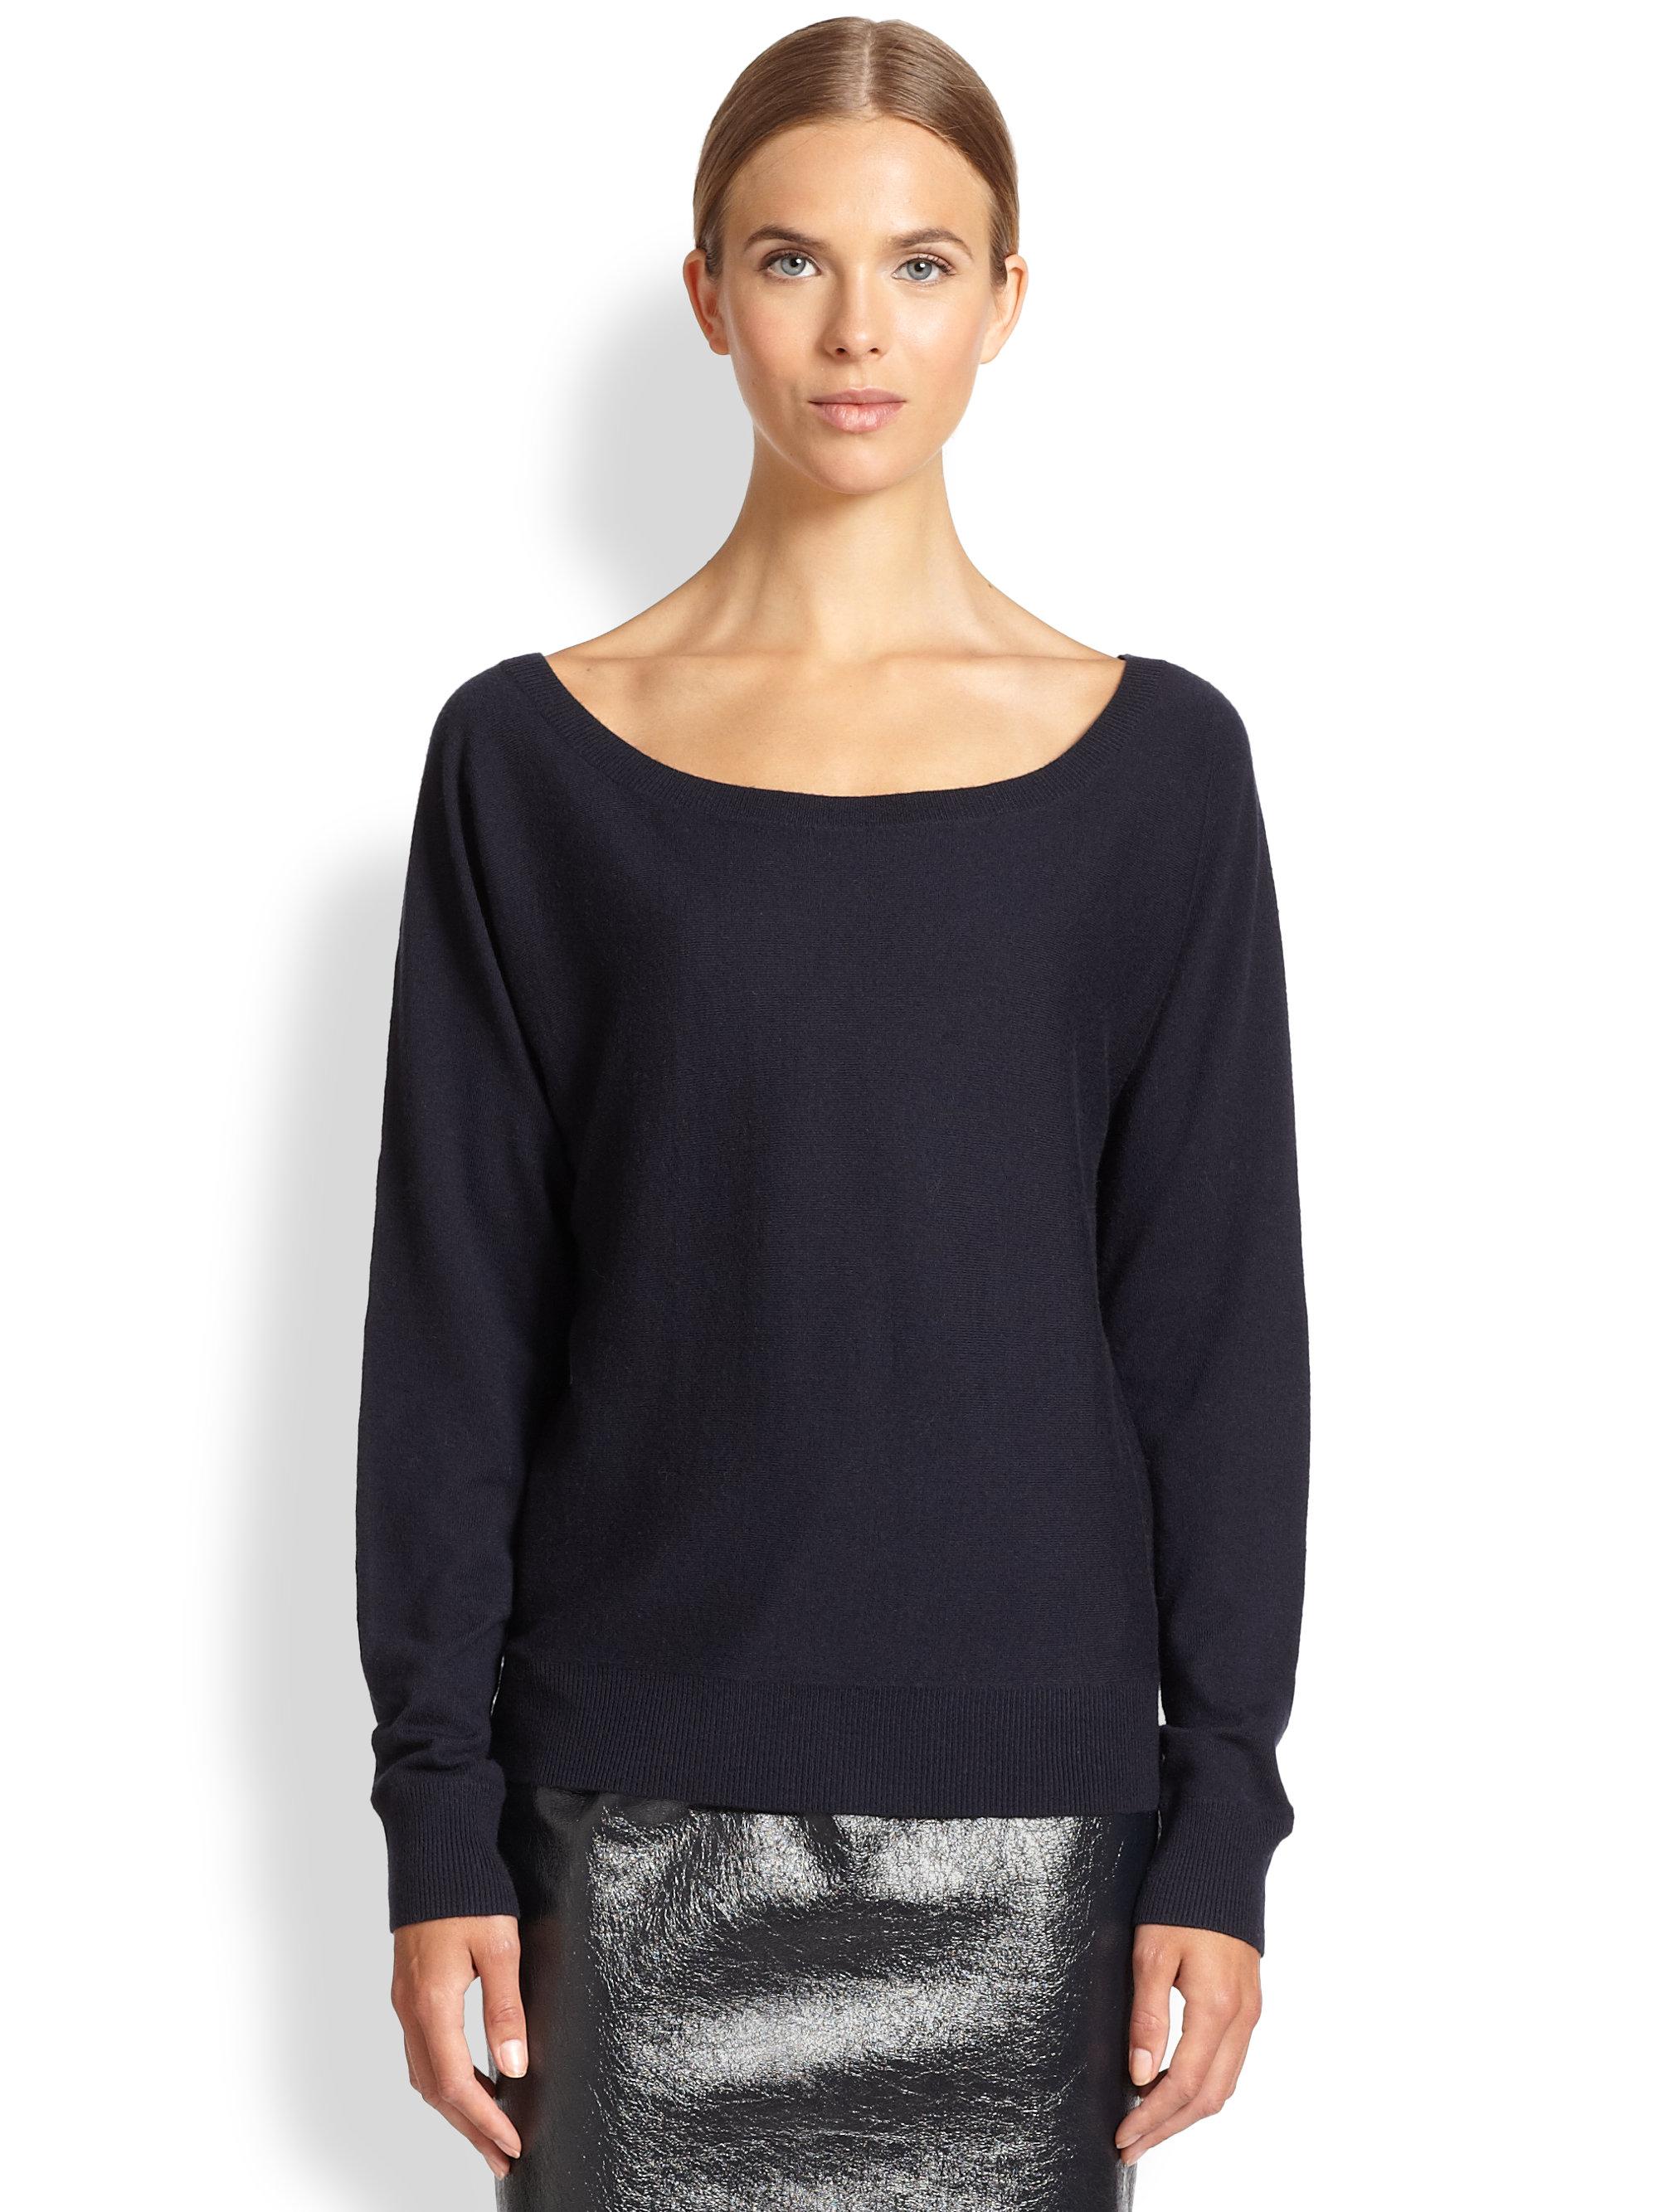 Tamara mellon Off-The-Shoulder Cashmere Sweater in Blue | Lyst